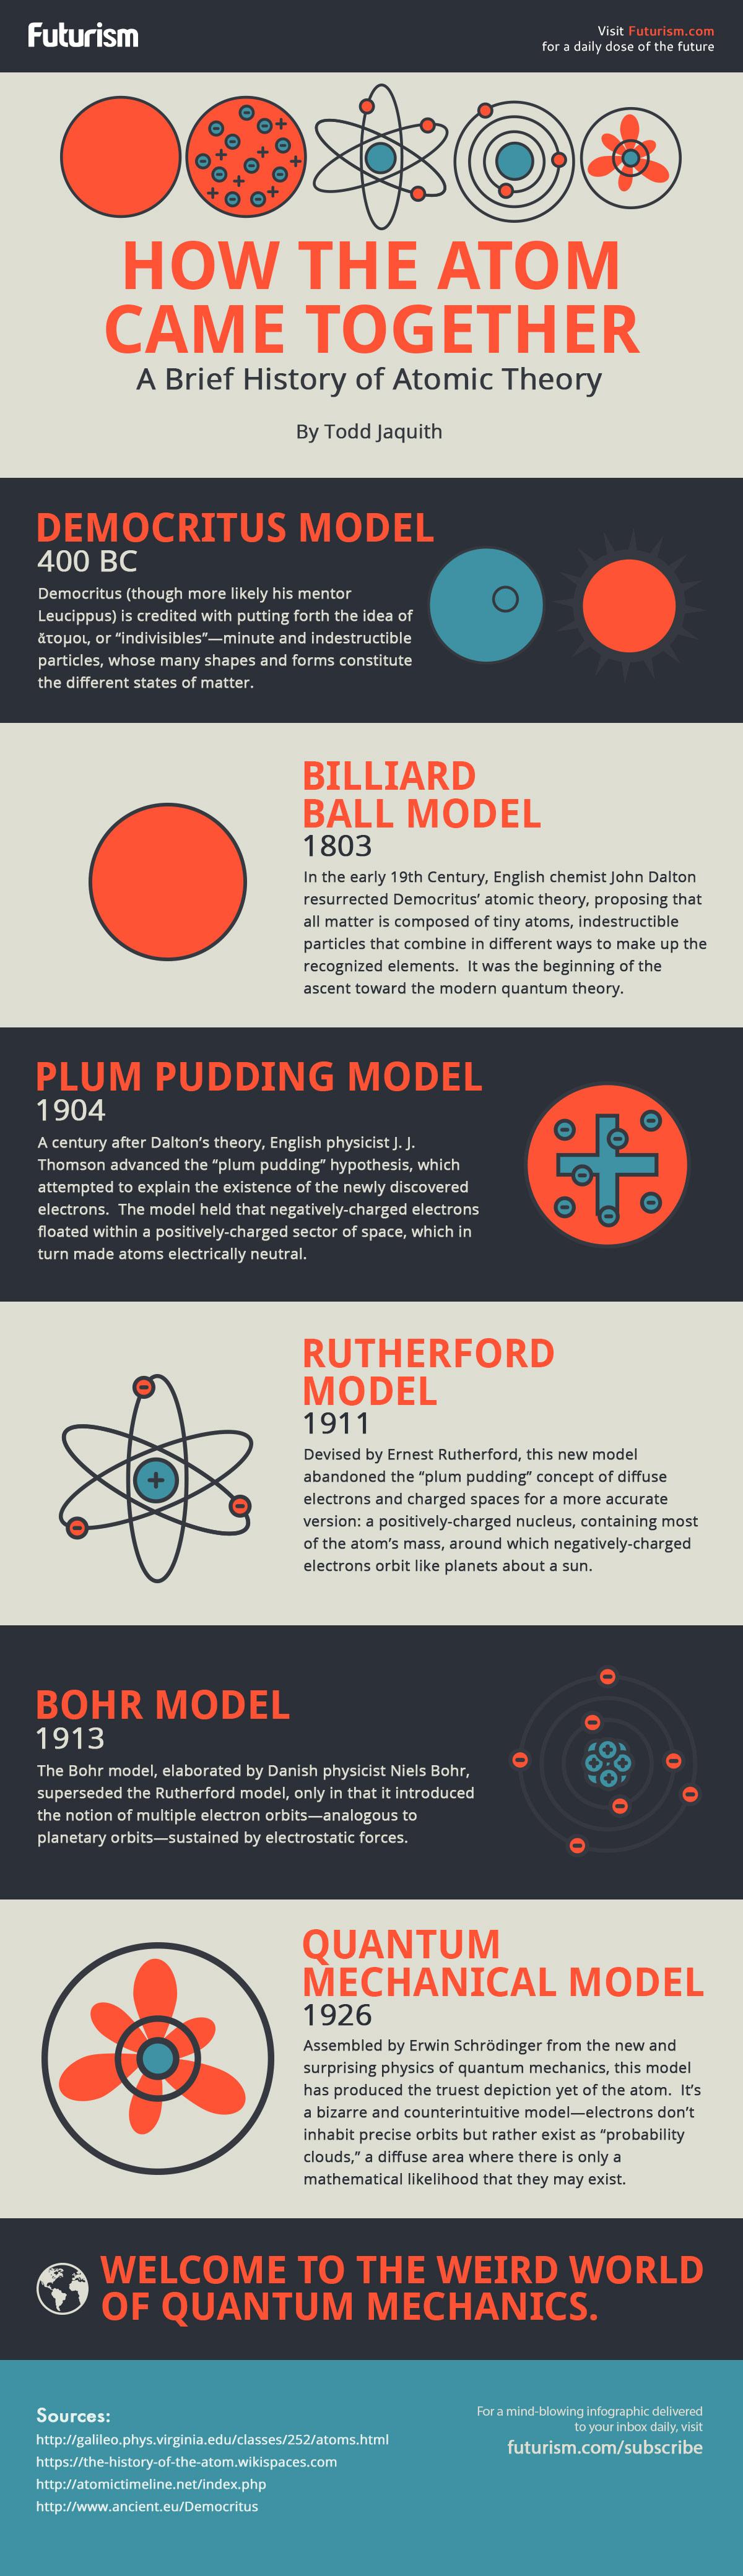 History of Atomic Theory